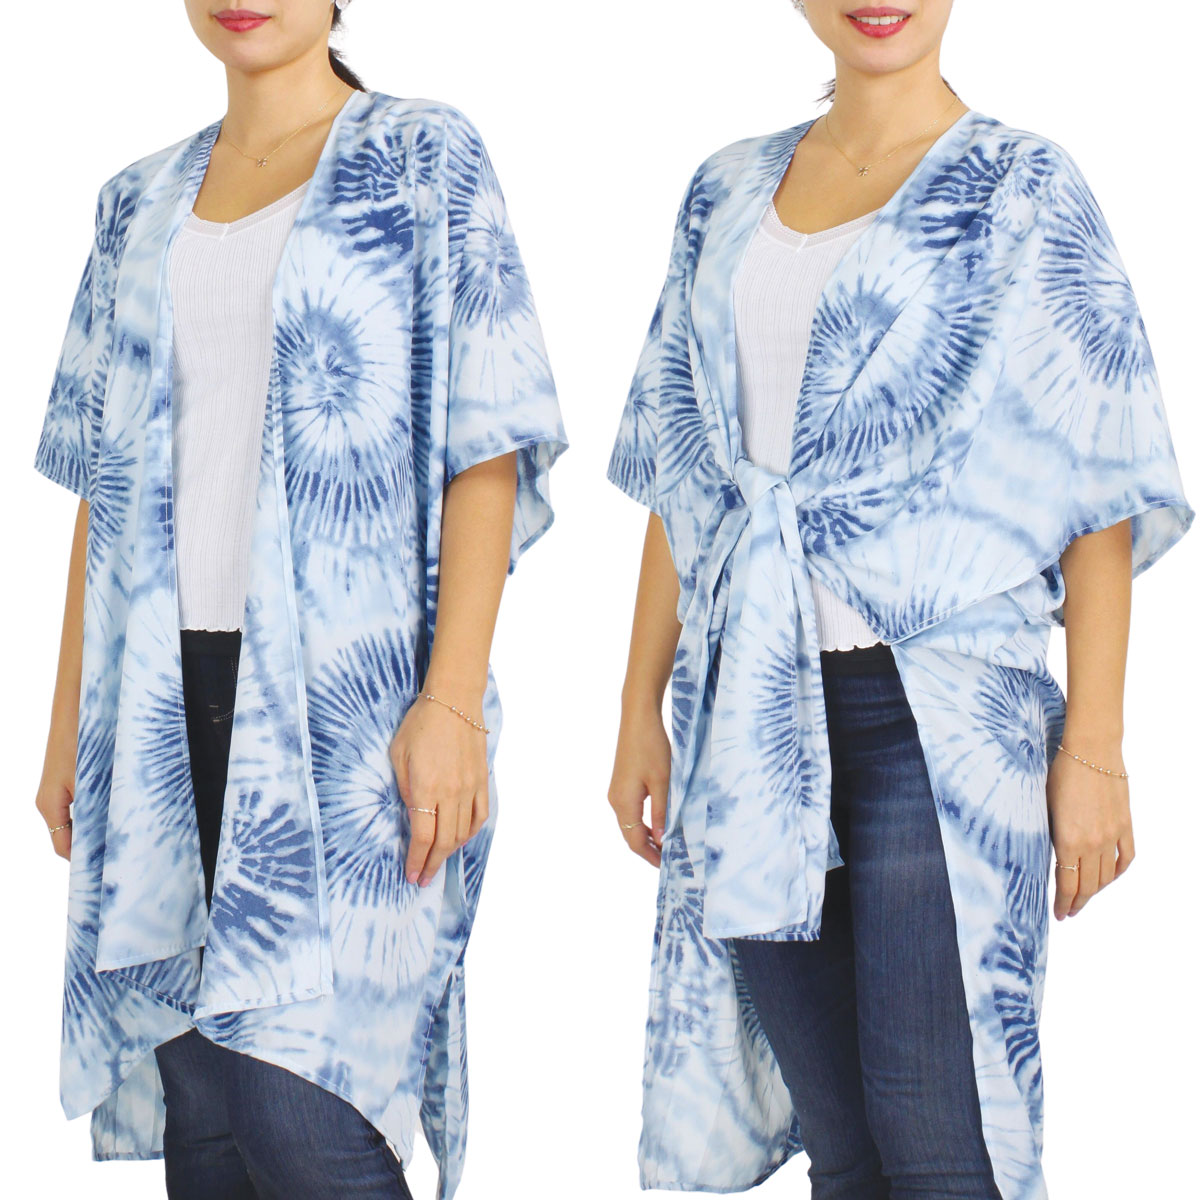 Kimono - Tie Dye 9923